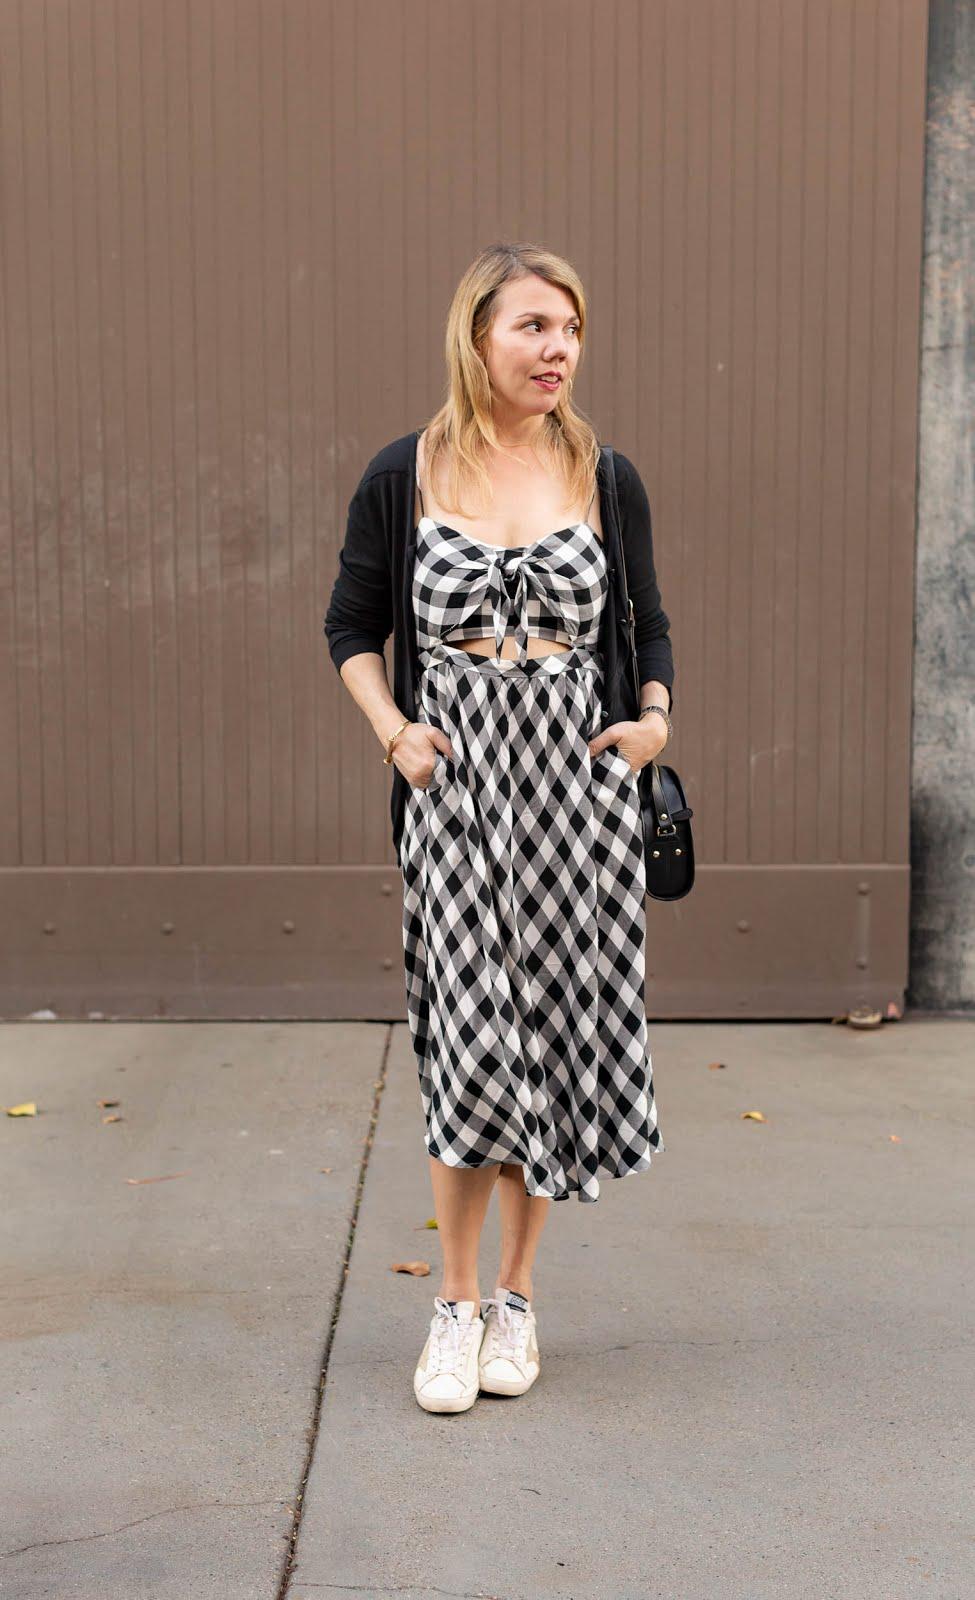 e3b0f840c49c What to wear to wine country in fall - Cheryl Shops